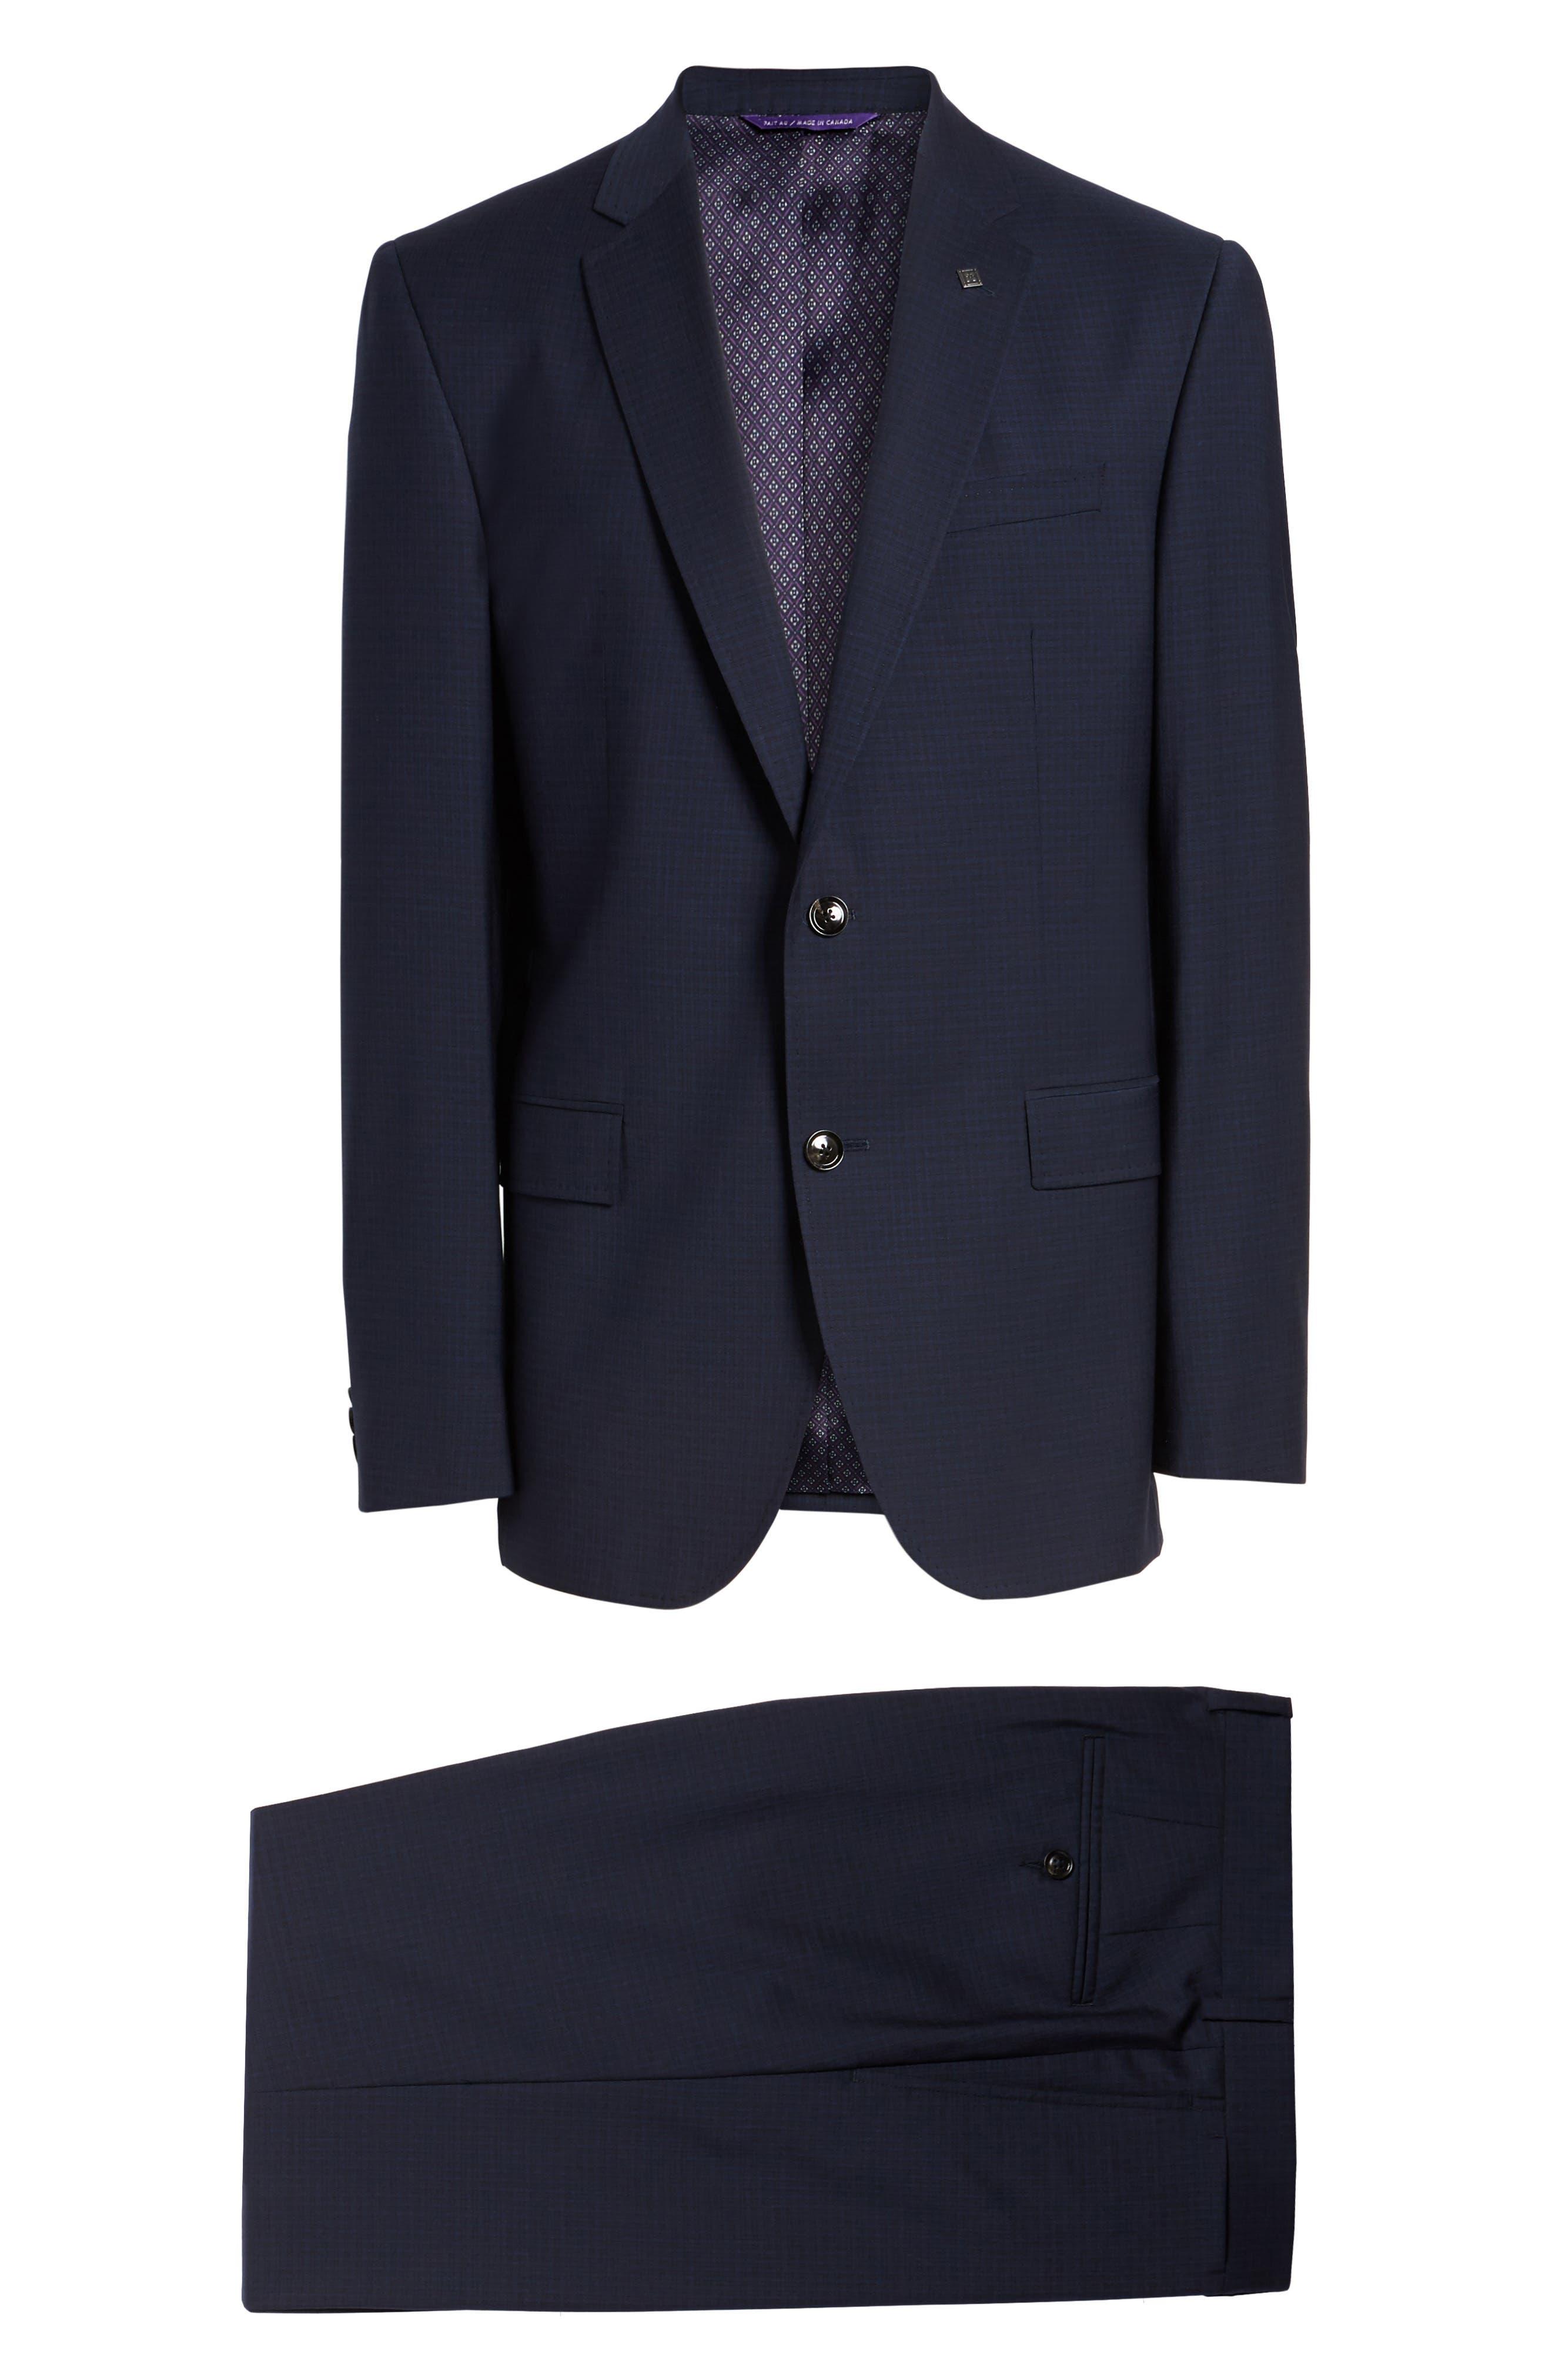 Jay Trim Fit Check Wool Suit,                             Alternate thumbnail 8, color,                             410